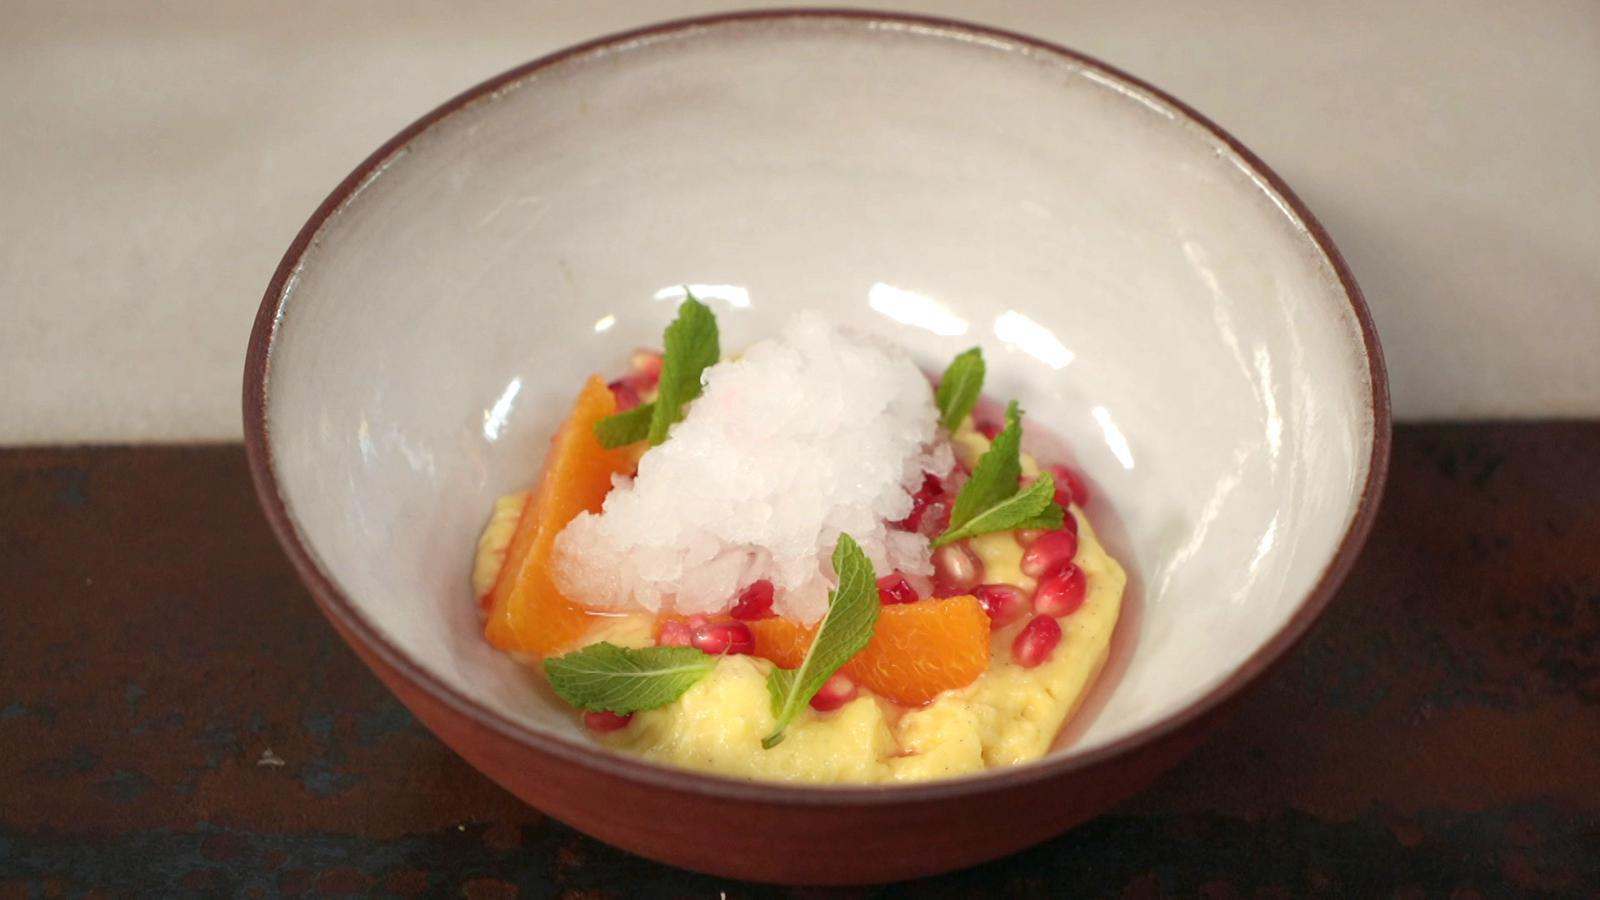 Salade van citrus met crème chiboust en granité van gin-tonic